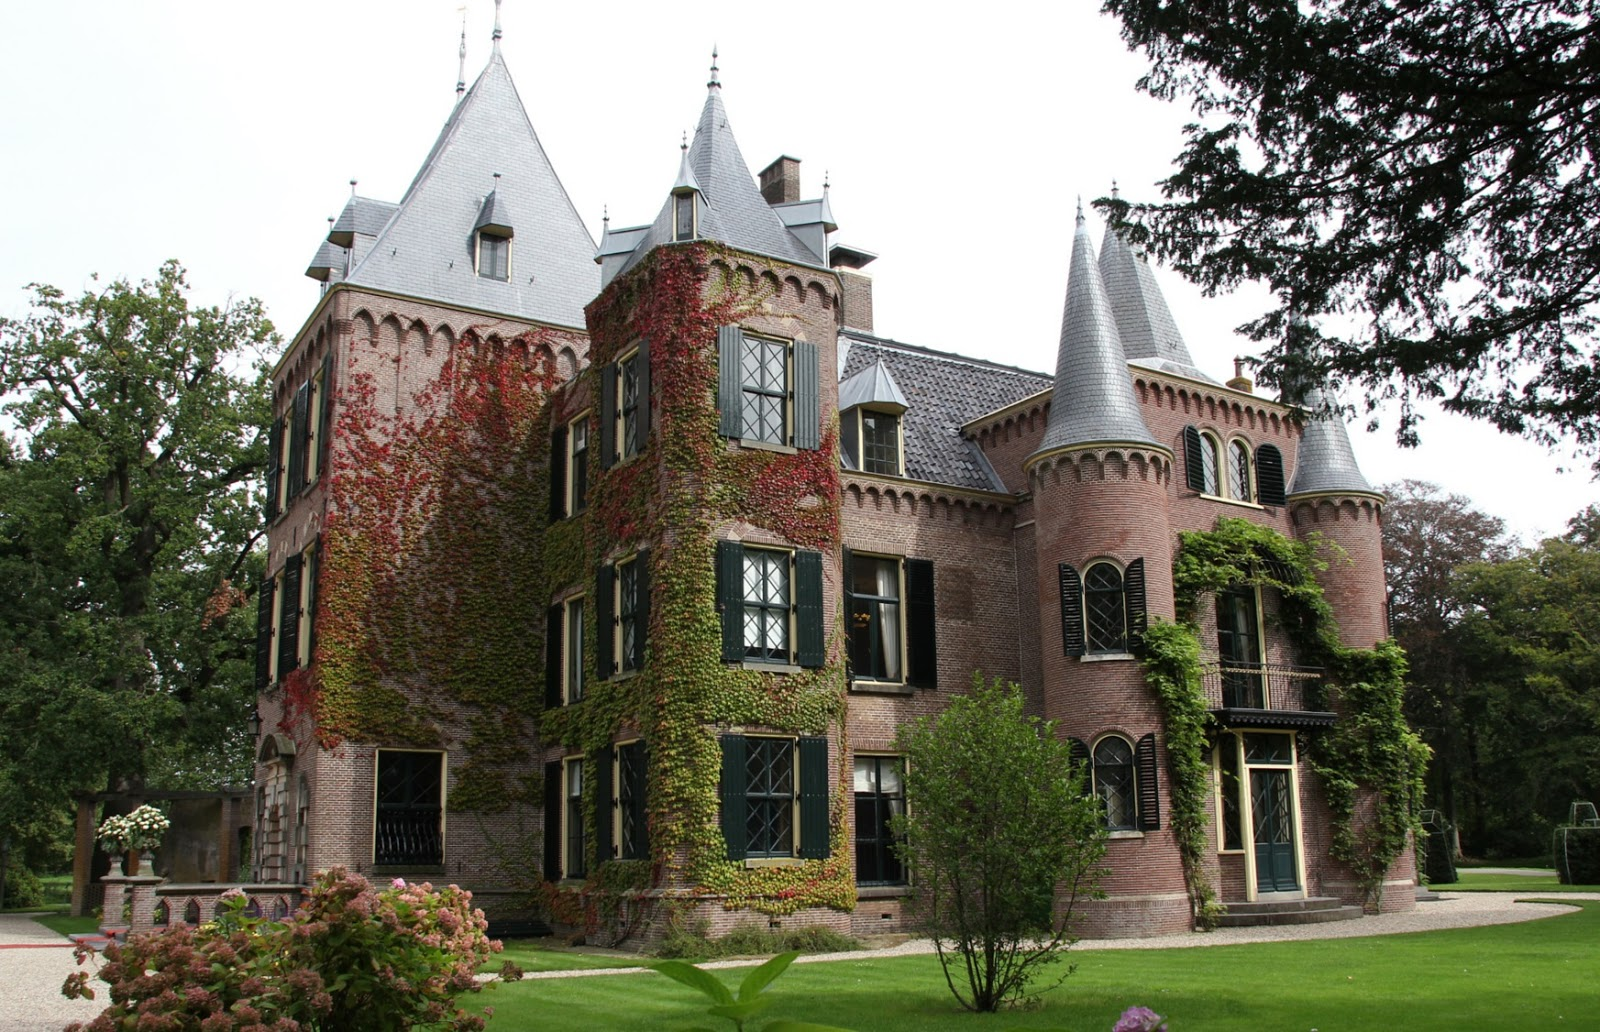 castelo-de-keukenhof